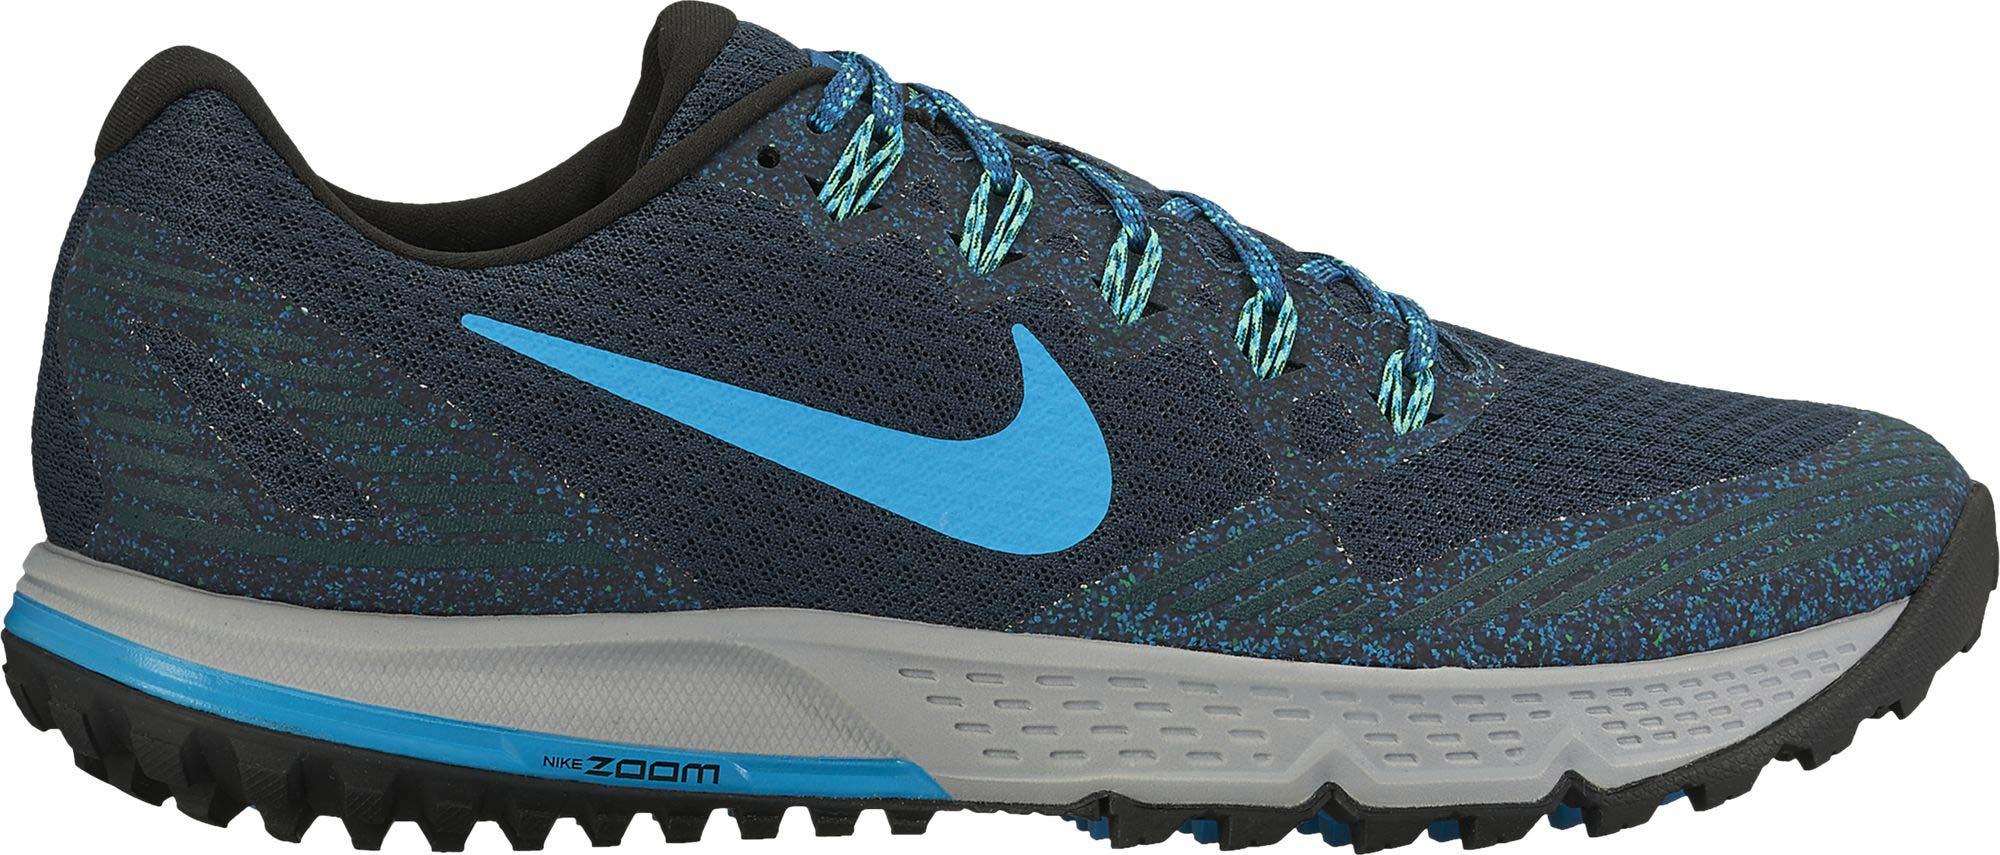 laaja valikoima Julkaisupäivä: halpa Nike AIR ZOOM WILDHORSE 3 | sportisimo.com